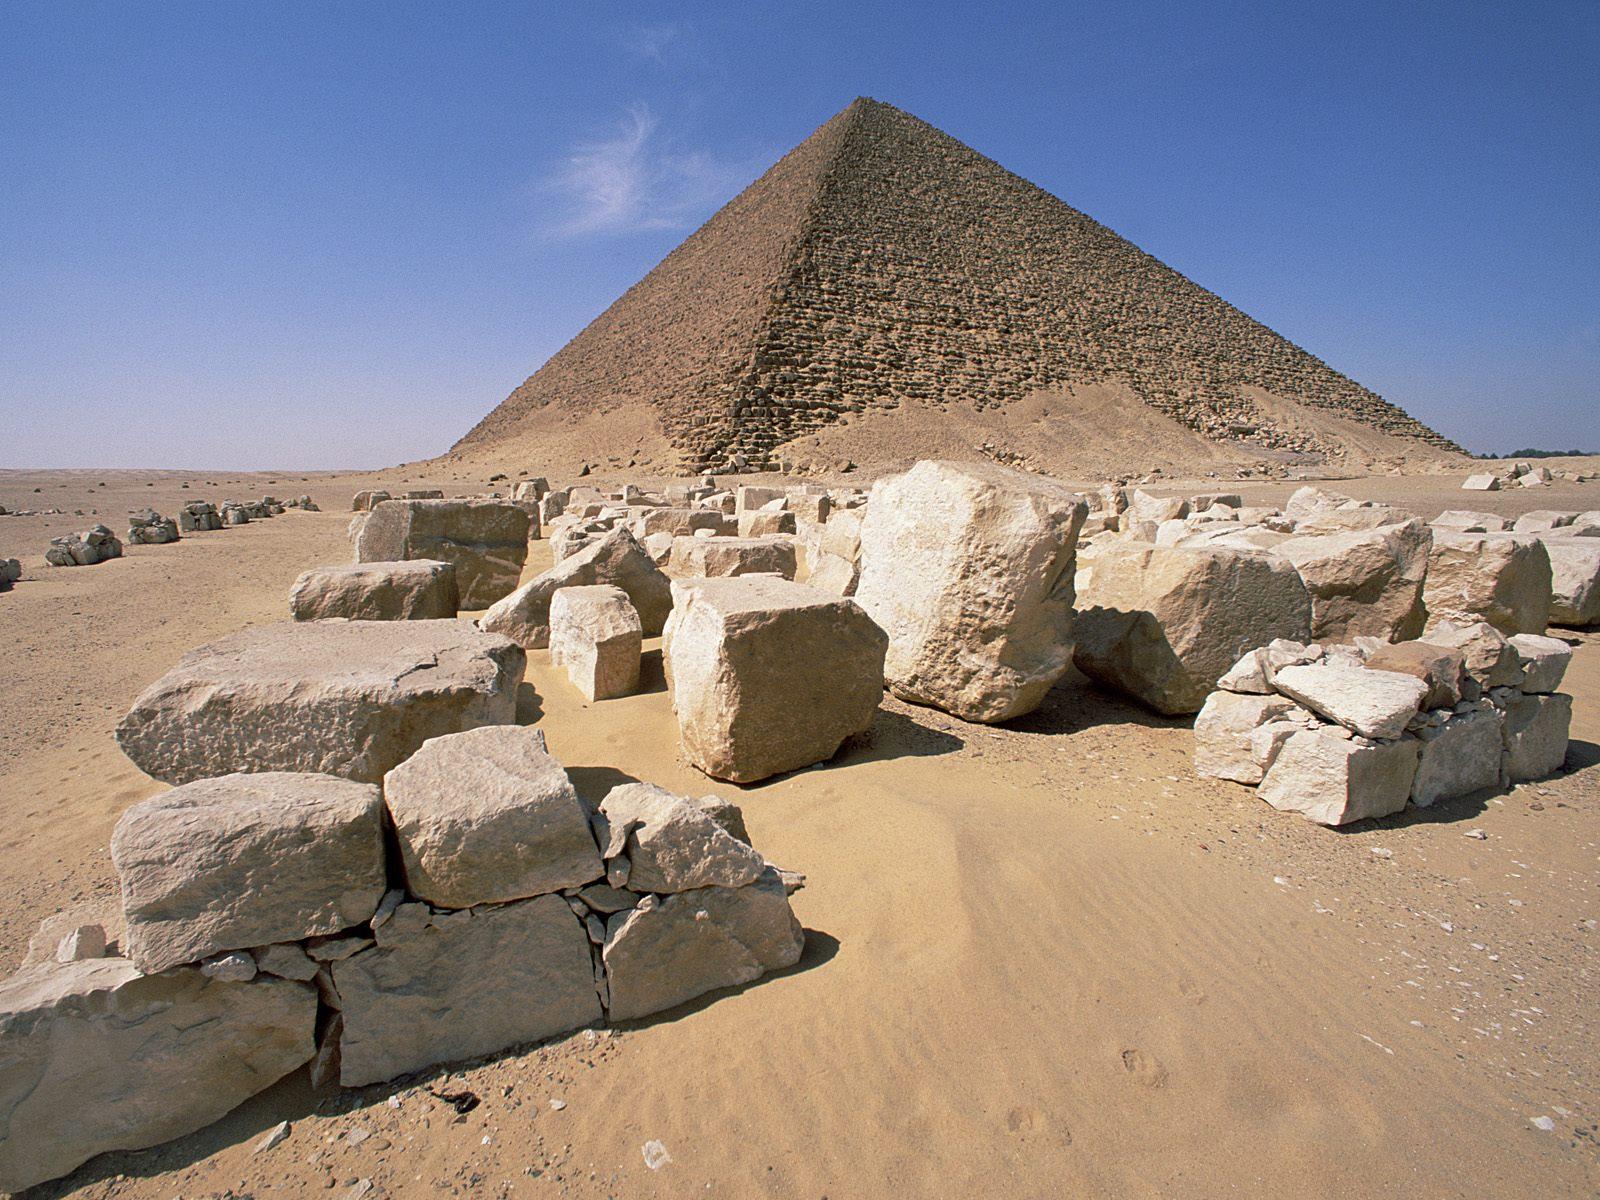 http://2.bp.blogspot.com/-ph03HkXZoJc/TnFAOVuu5qI/AAAAAAAAOvY/wSP3152eMbI/s1600/White+Pyramid+of+King+Snefru%252C+Dahshur%252C+Egypt.jpg